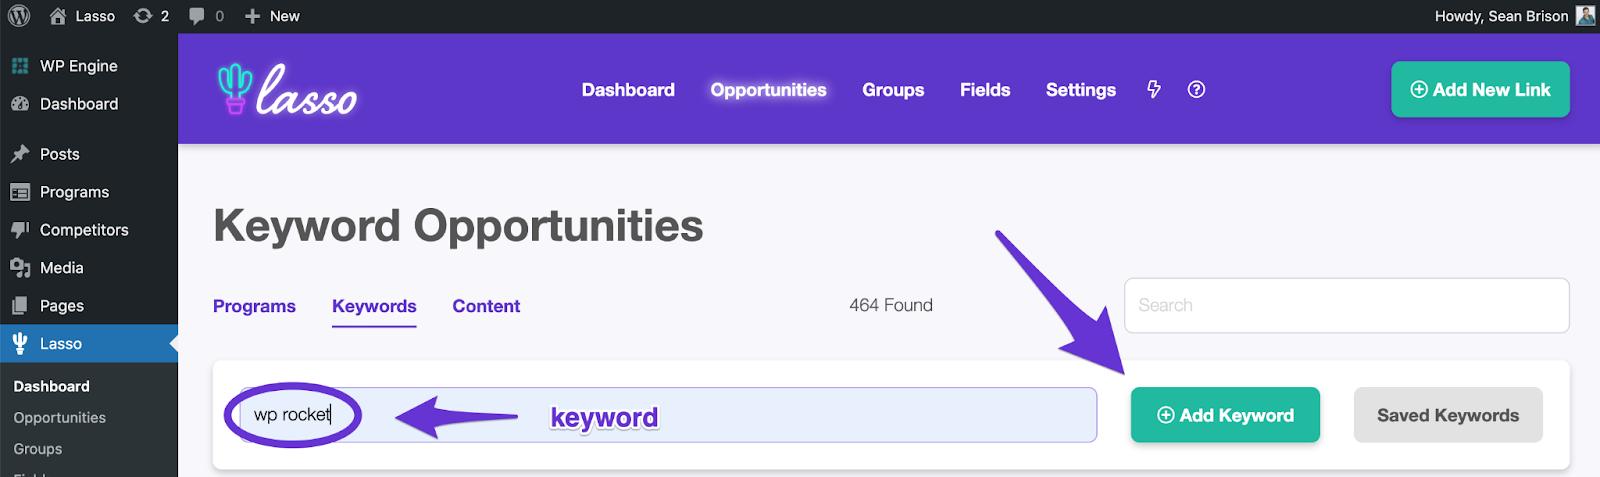 adding a keyword to lasso